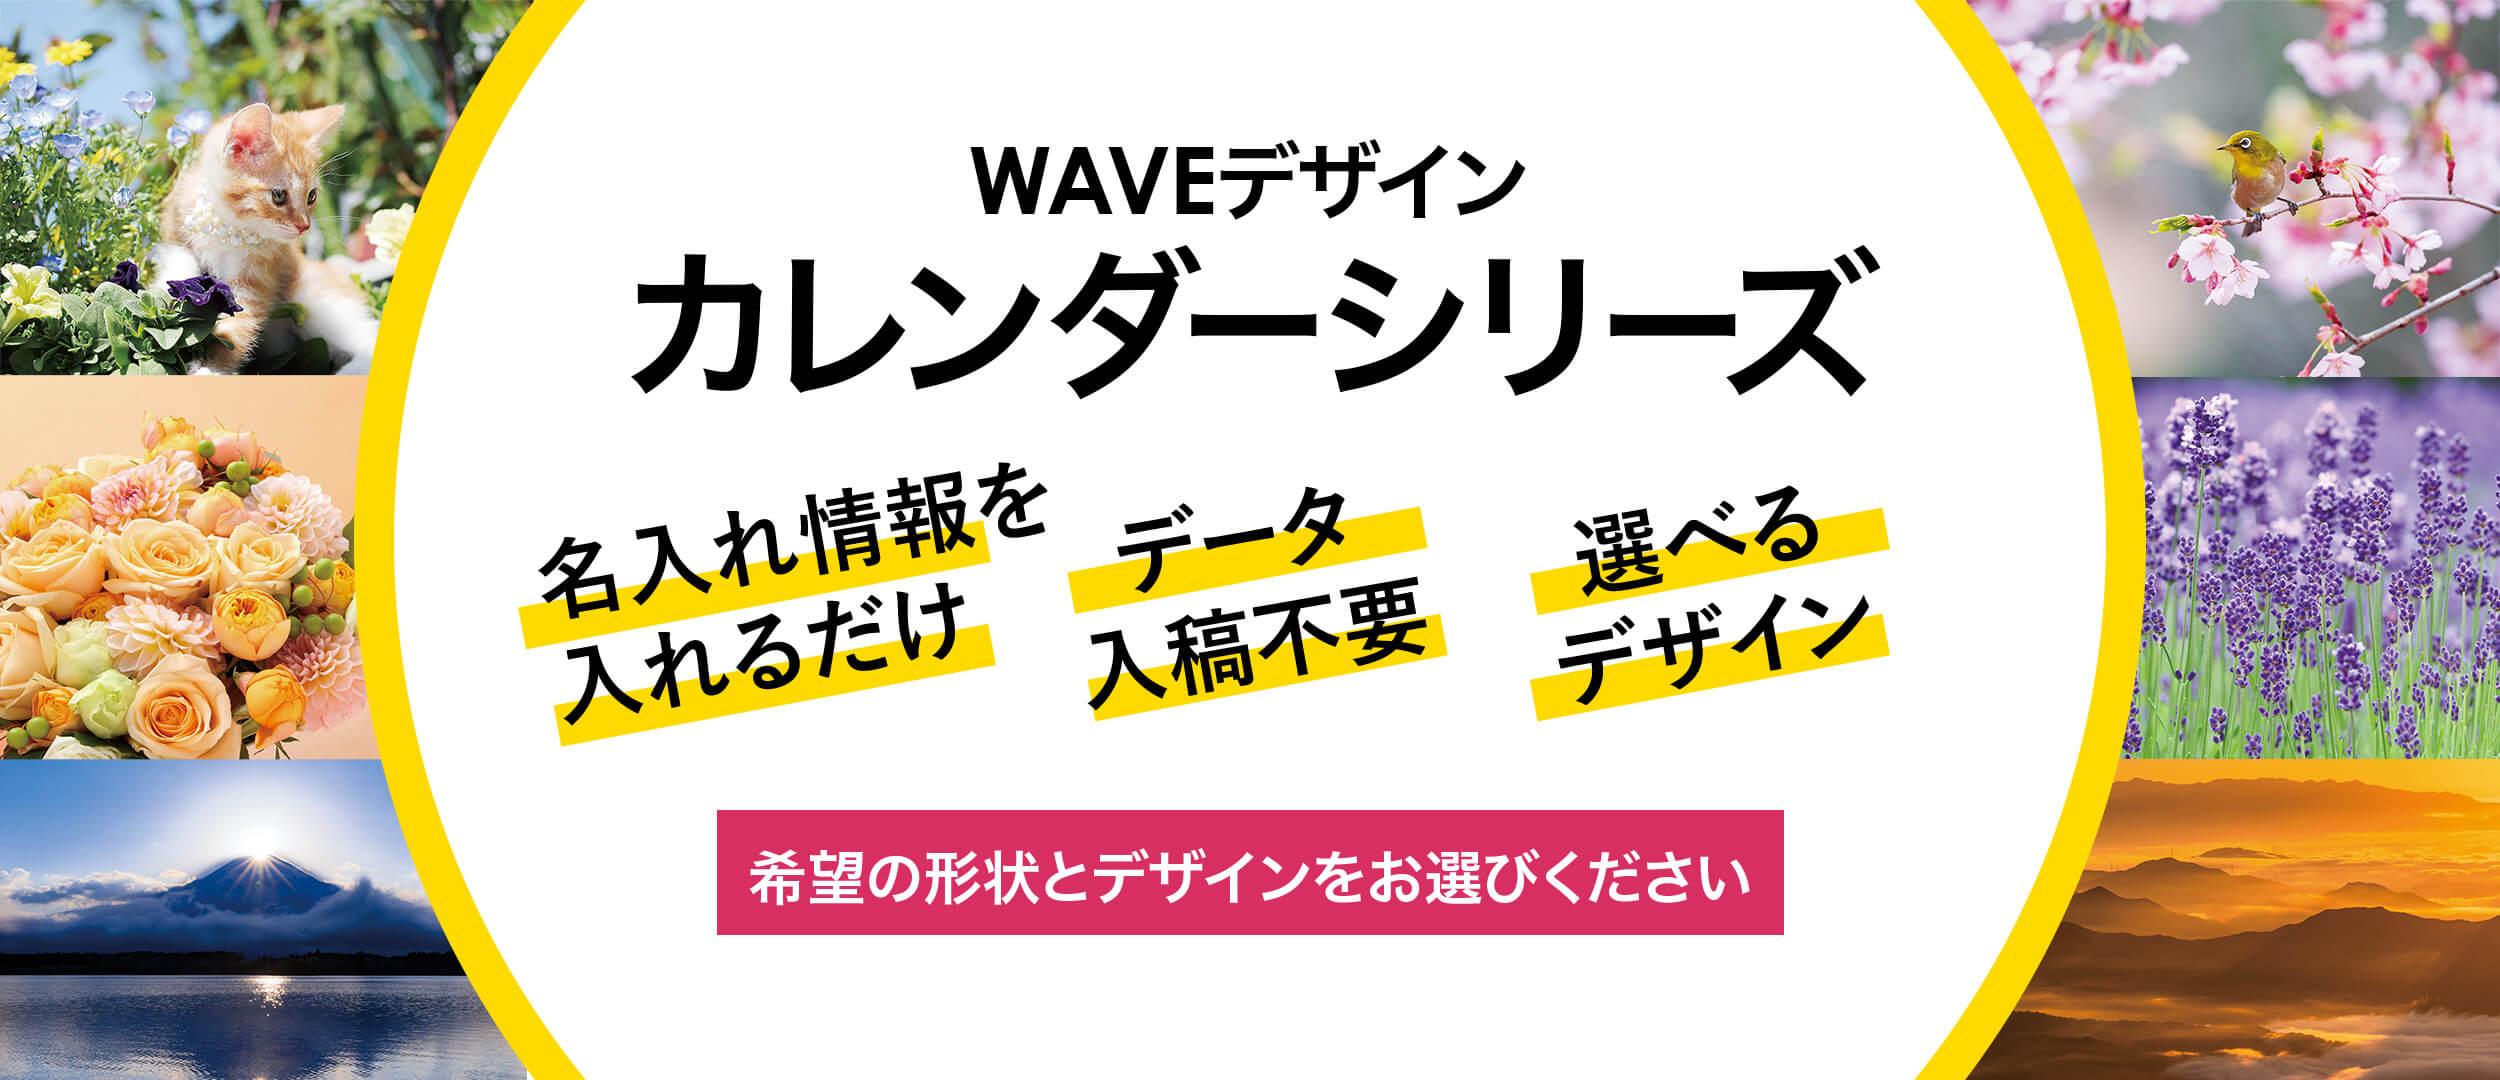 WAVEデザインカレンダーシリーズ